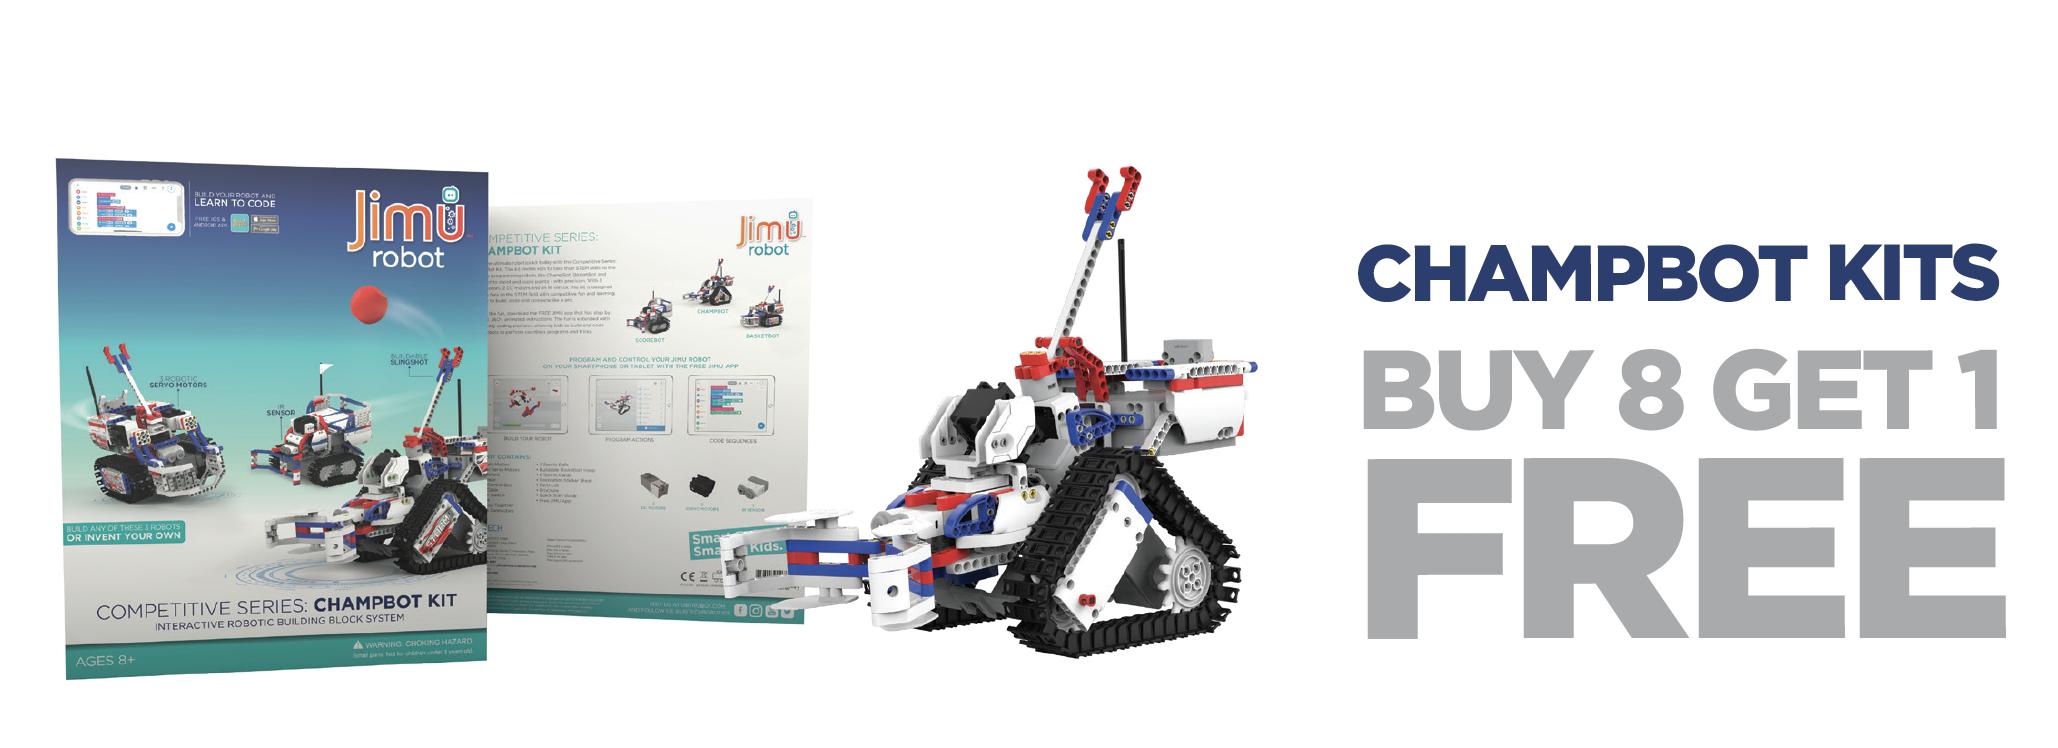 ChampBotKit-Buy8